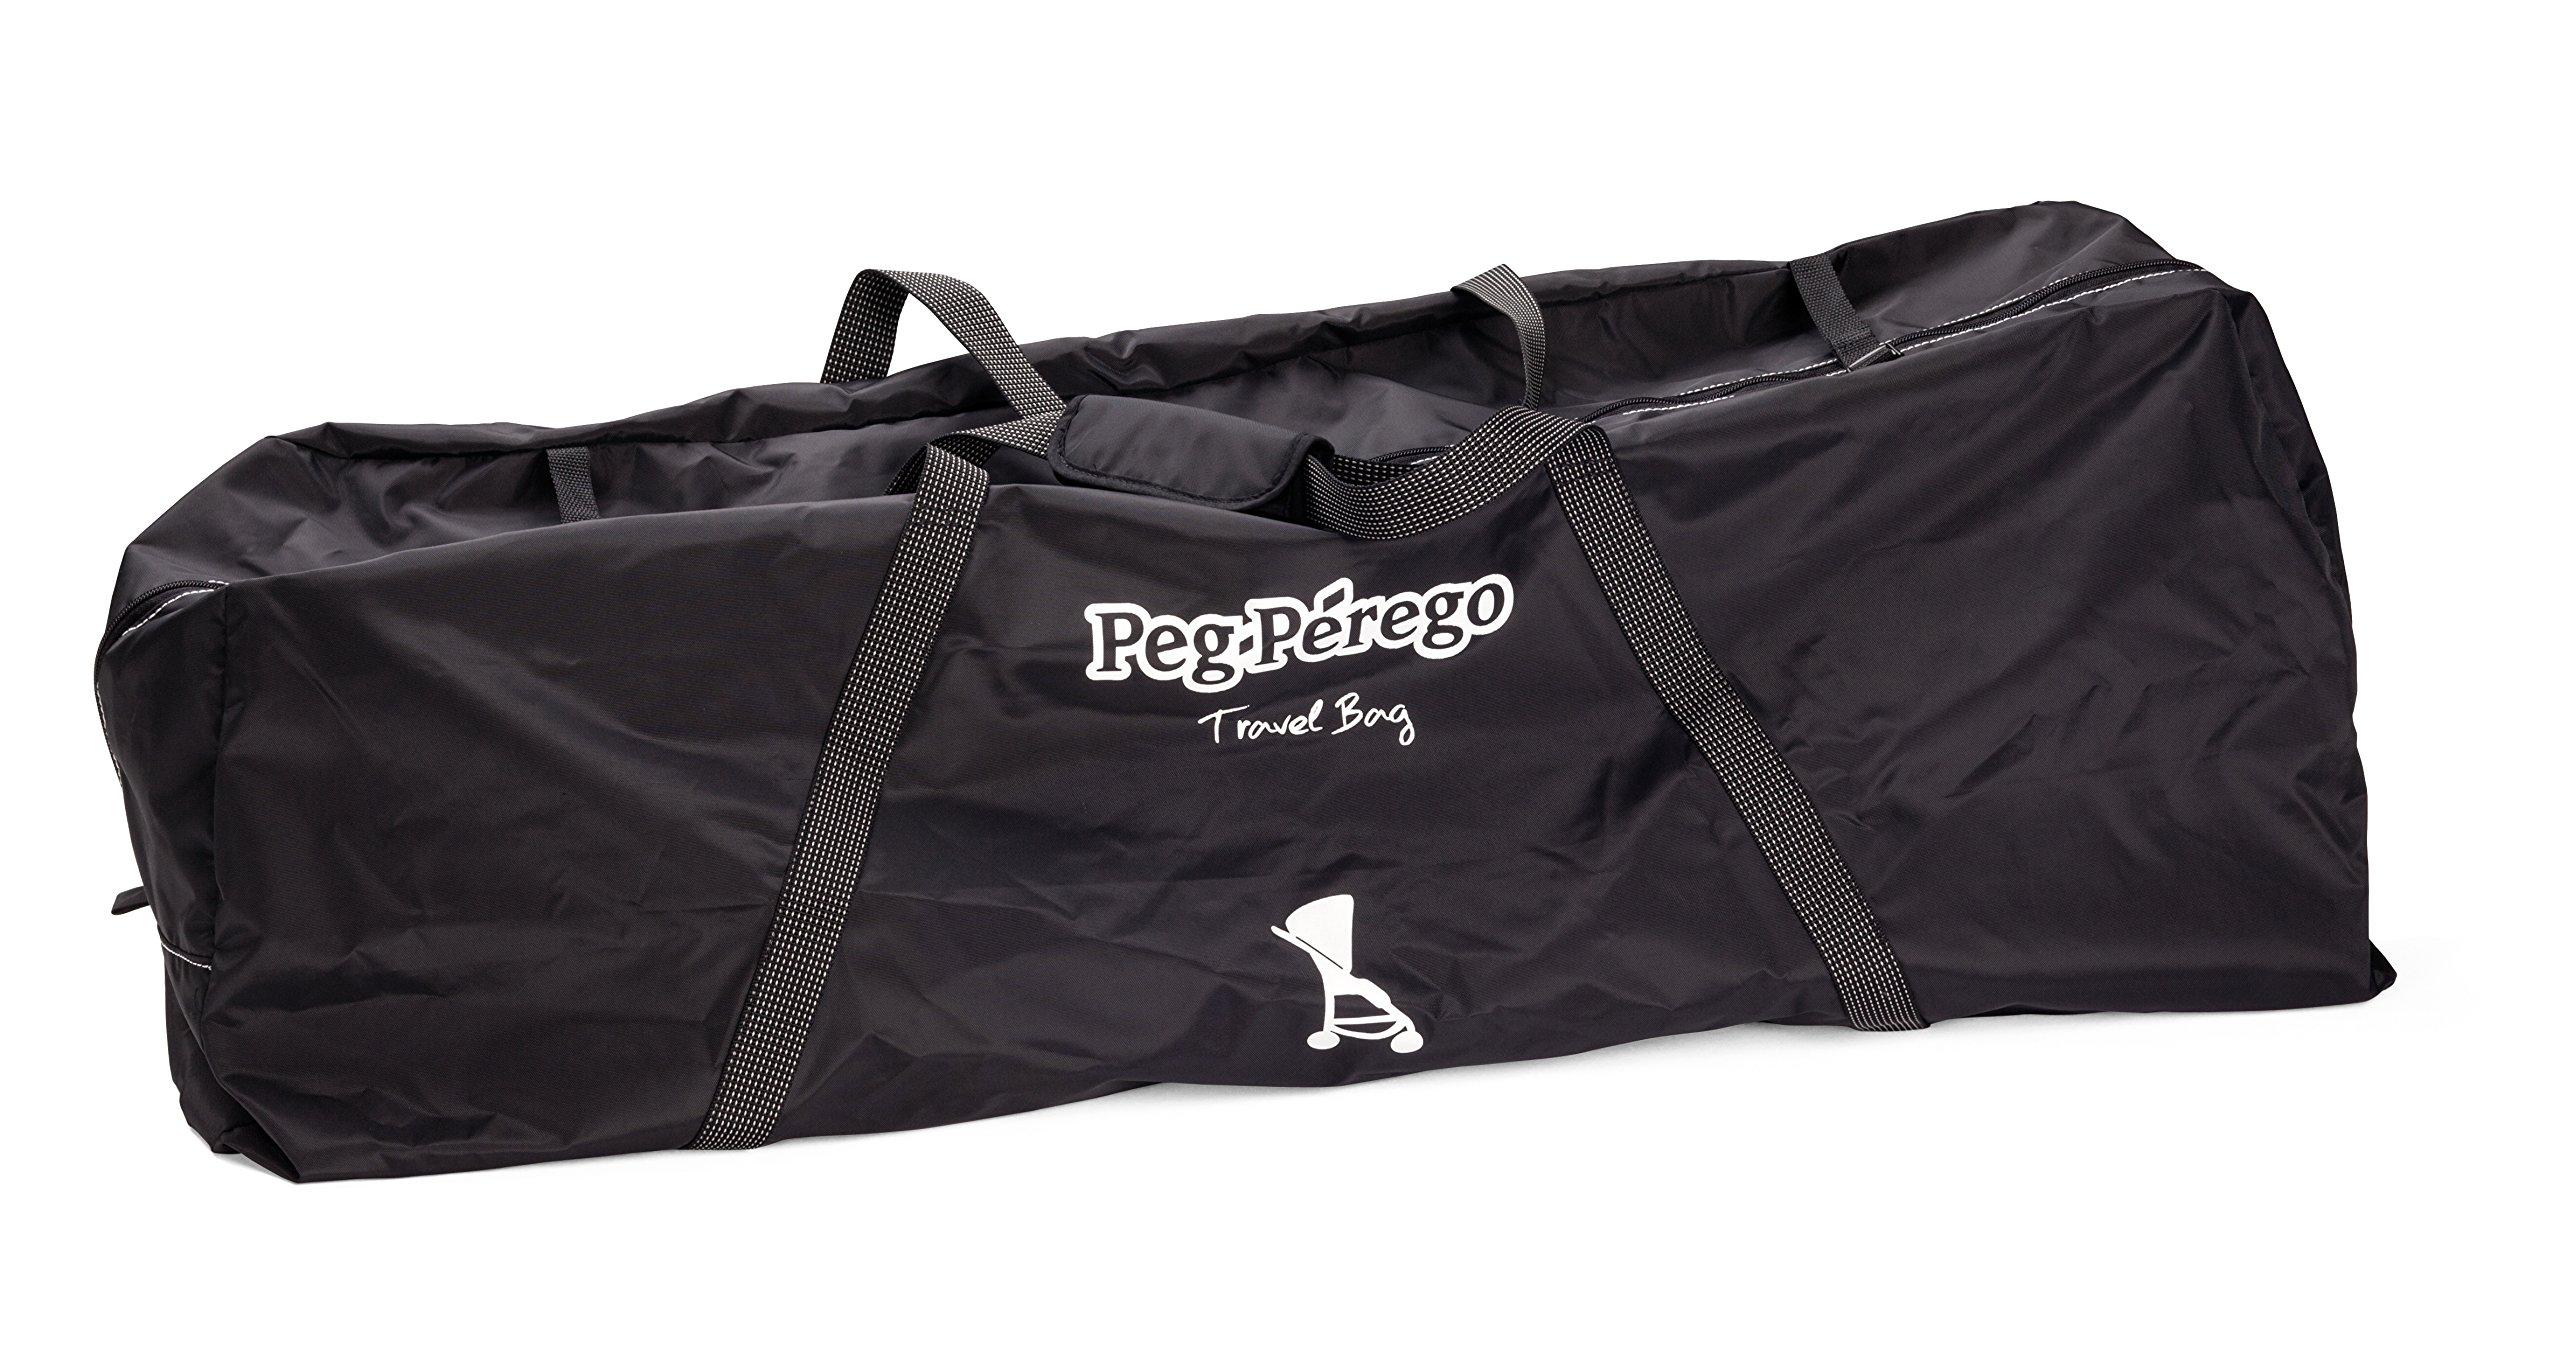 Peg Perego Stroller Travel Bag